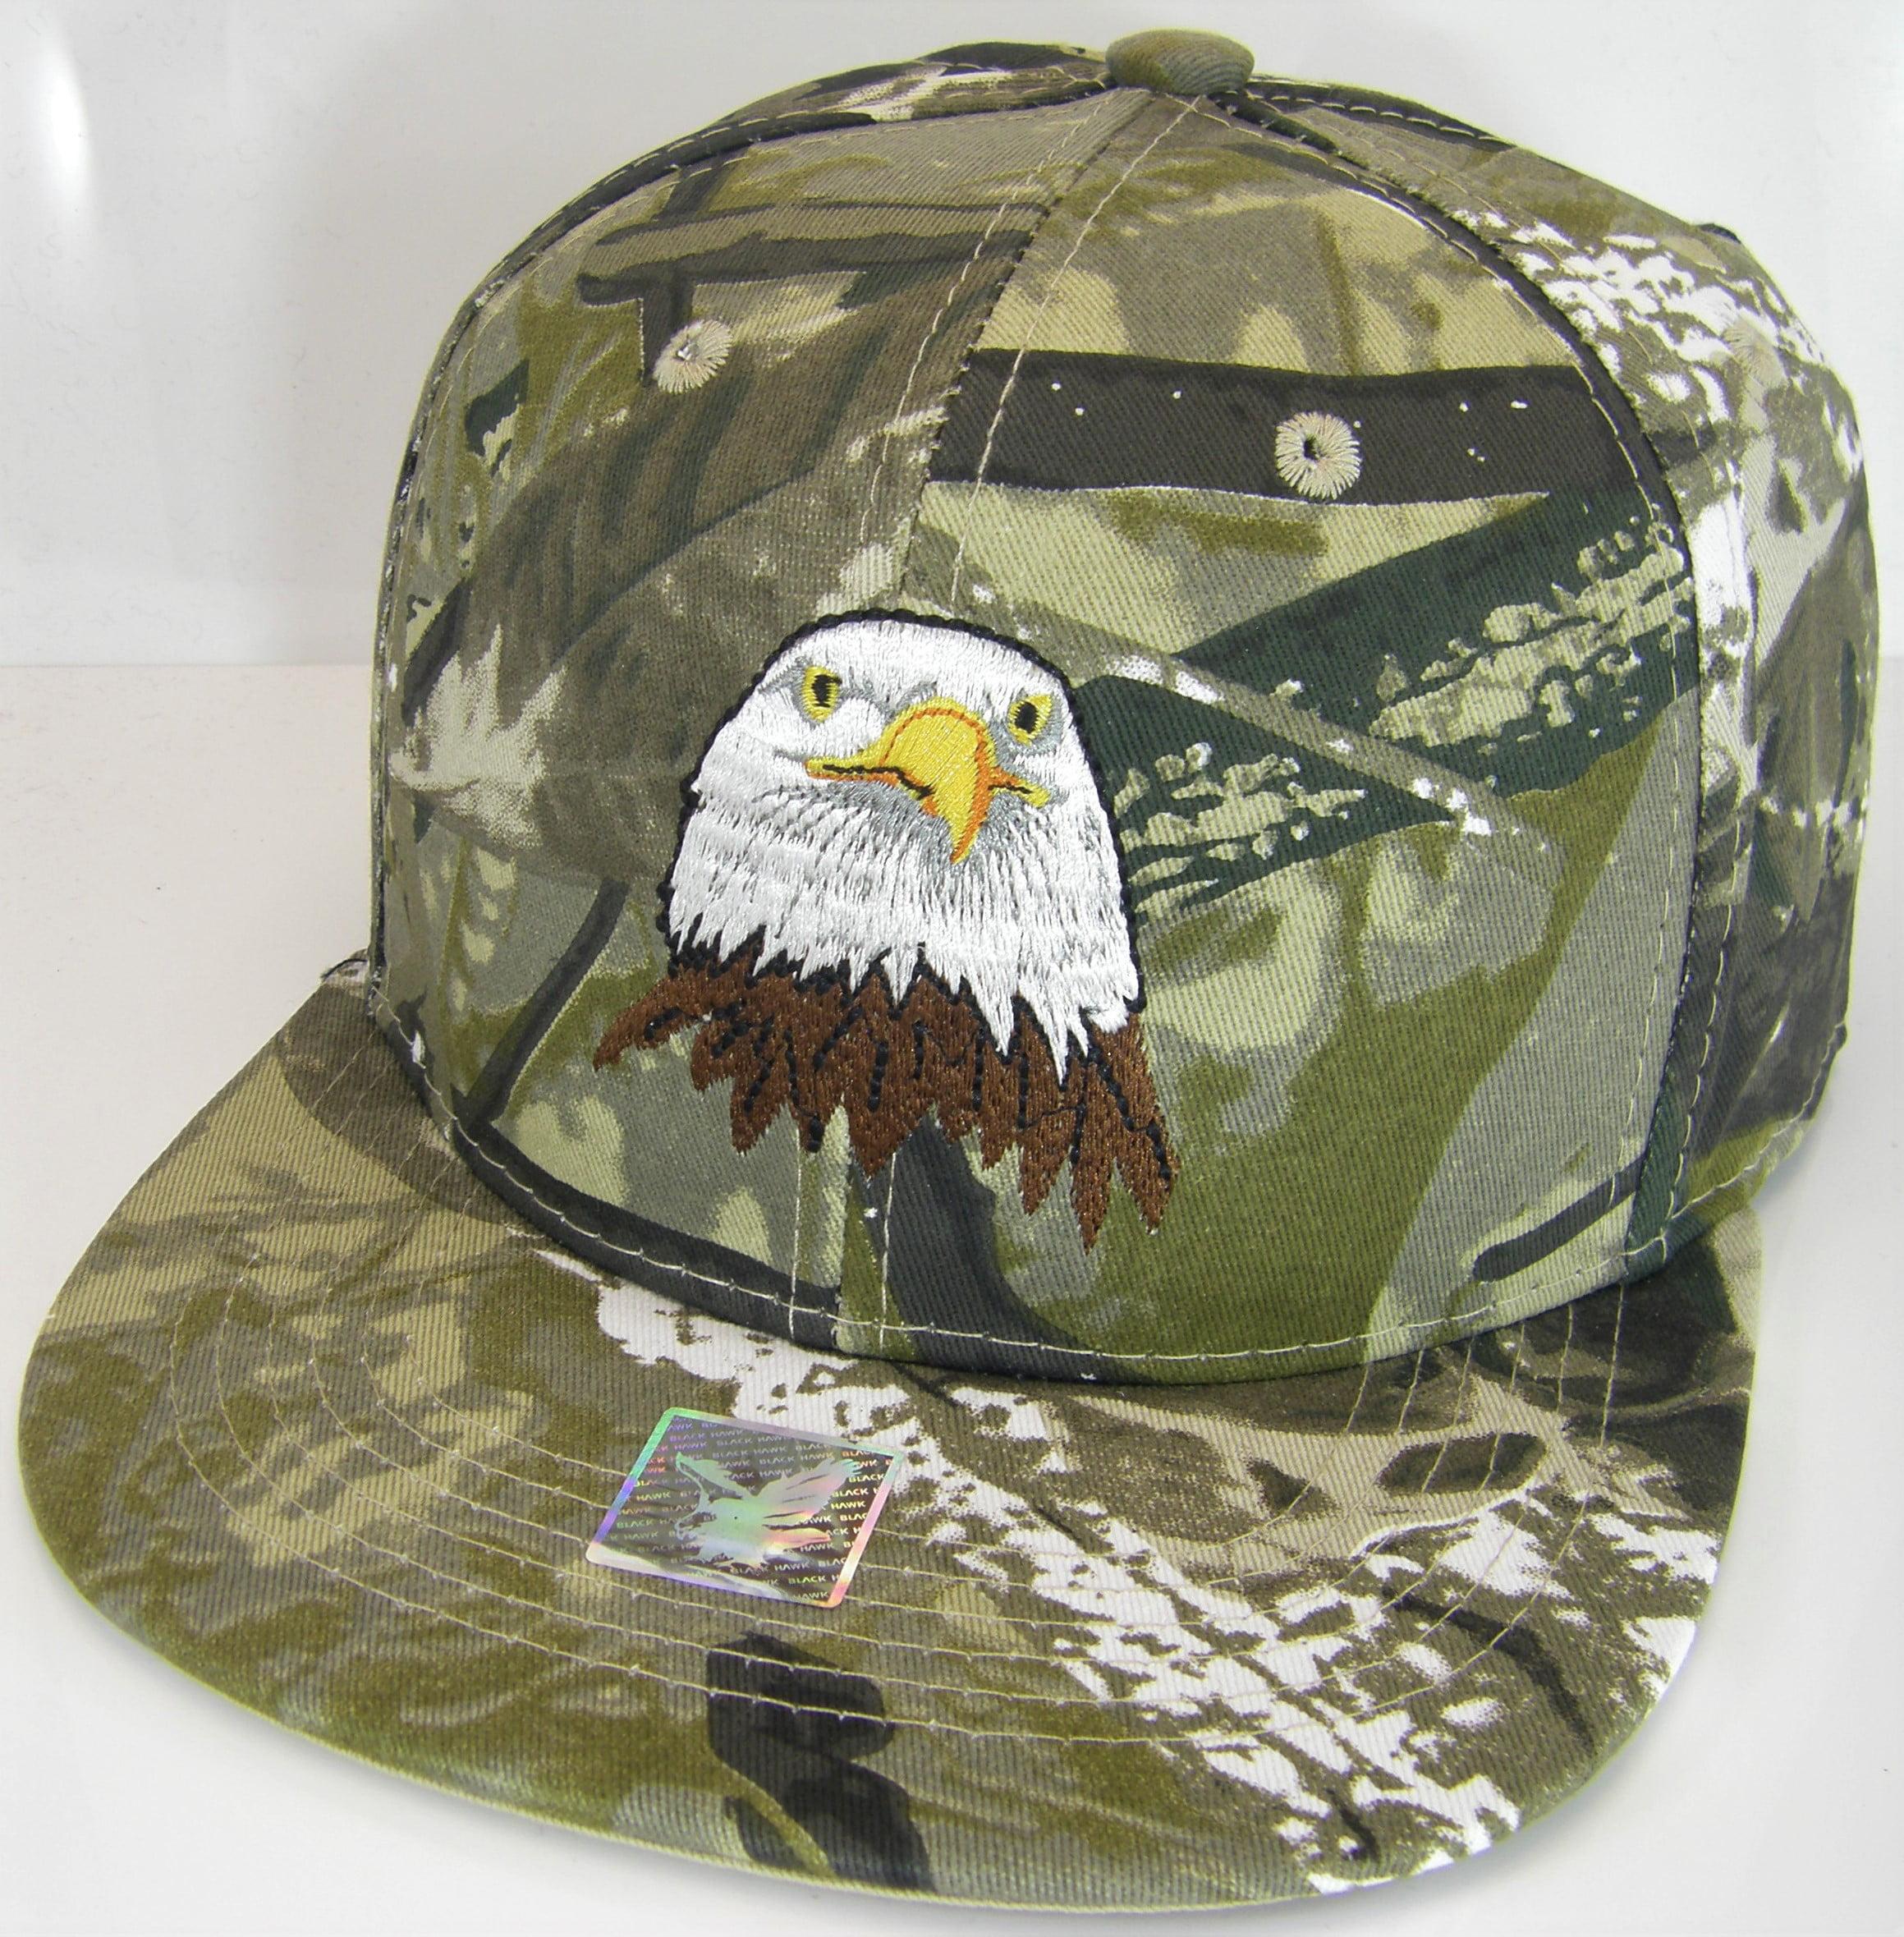 ee759e0af1c Joycap - USA Men s Patriotic Eagle Head   Side Flag Adjustable Snapback Baseball  Cap (Hunting Camo) - Walmart.com